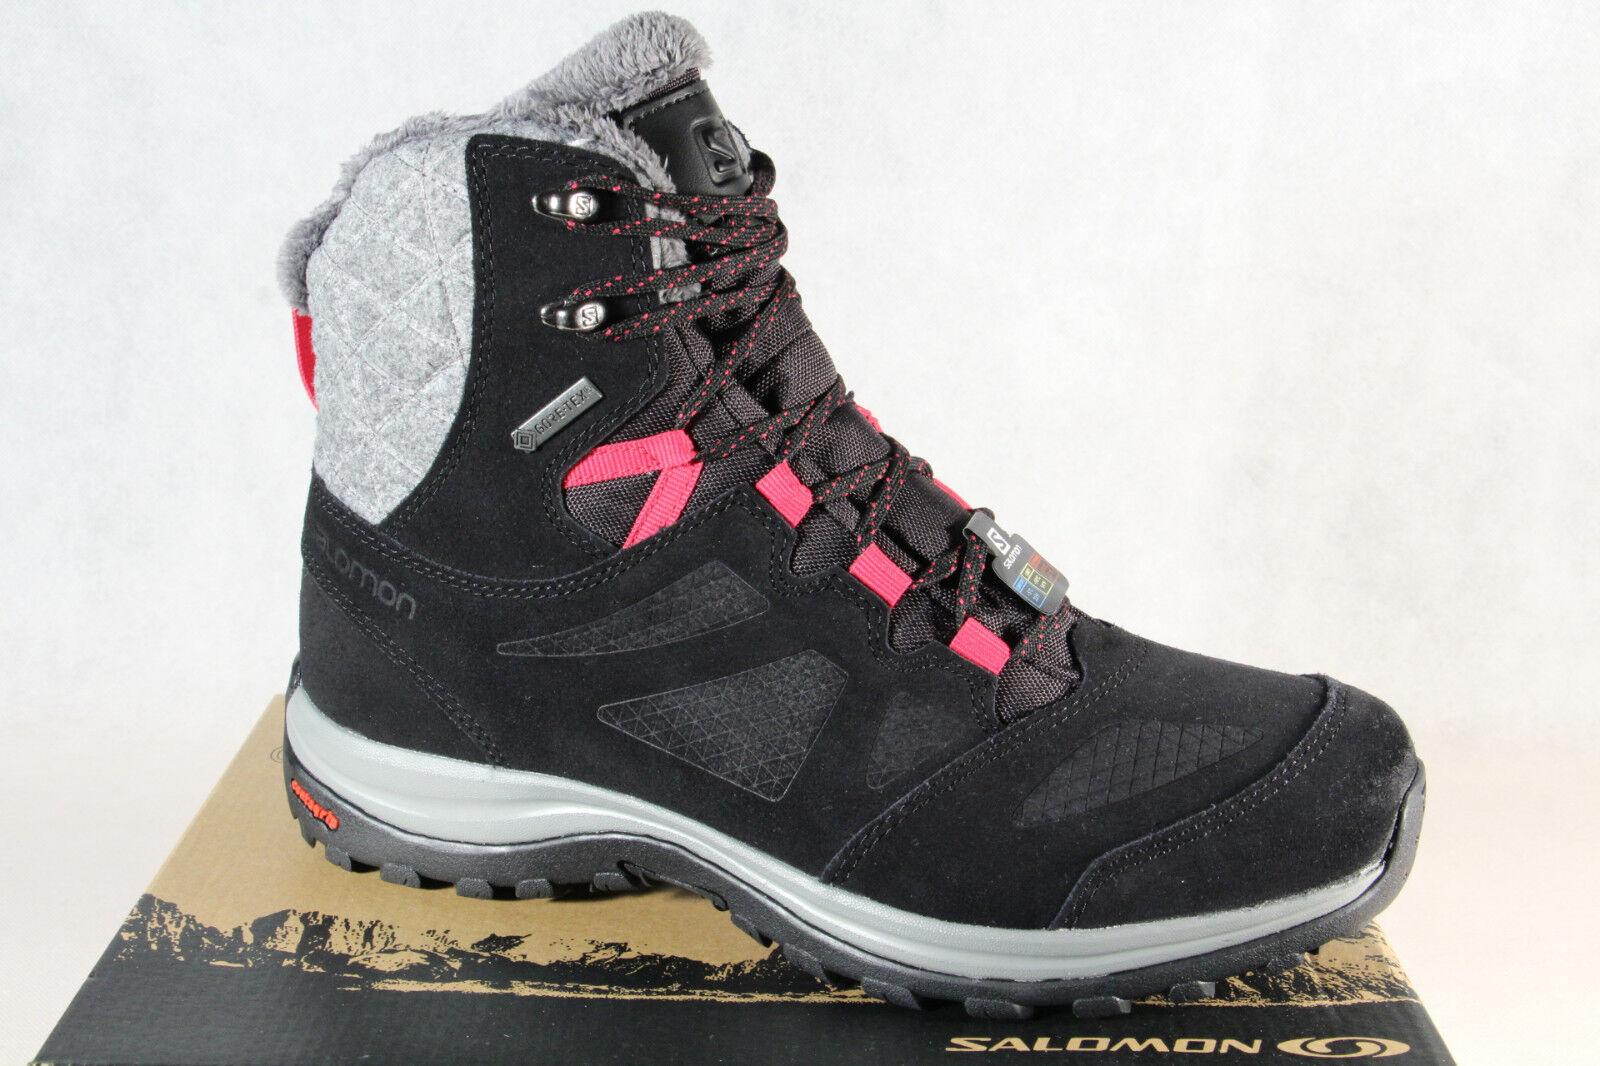 Salomon Ellipse Winter GTX Boots 404699 Boots Black Waterproof Gore-Tex New